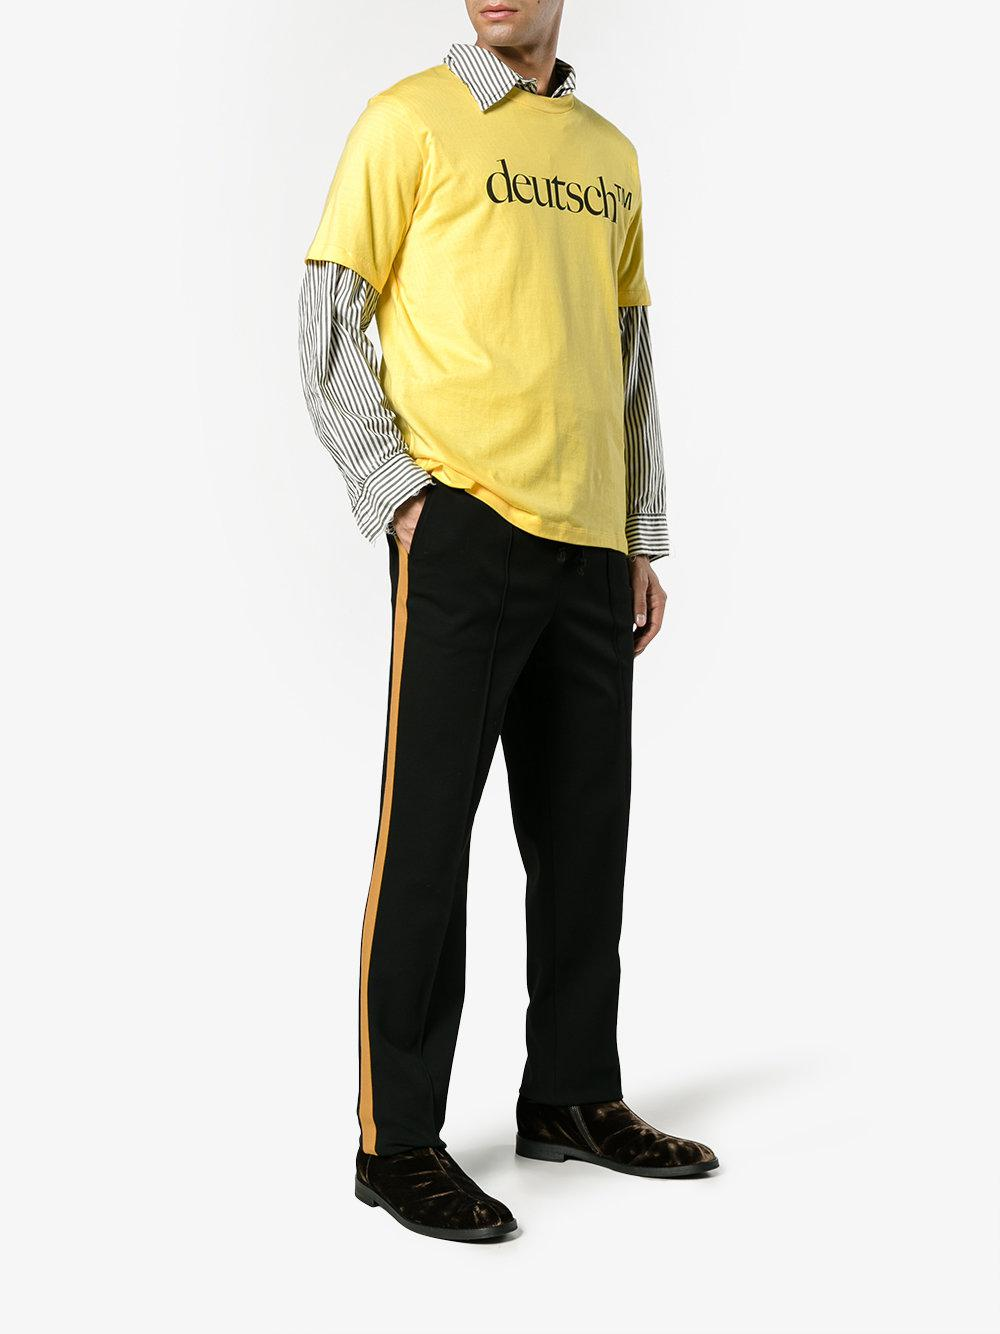 Deutsch t-shirt - Yellow & Orange John Lawrence Sullivan Discounts Online Buy Cheap 100% Authentic dWAsNF